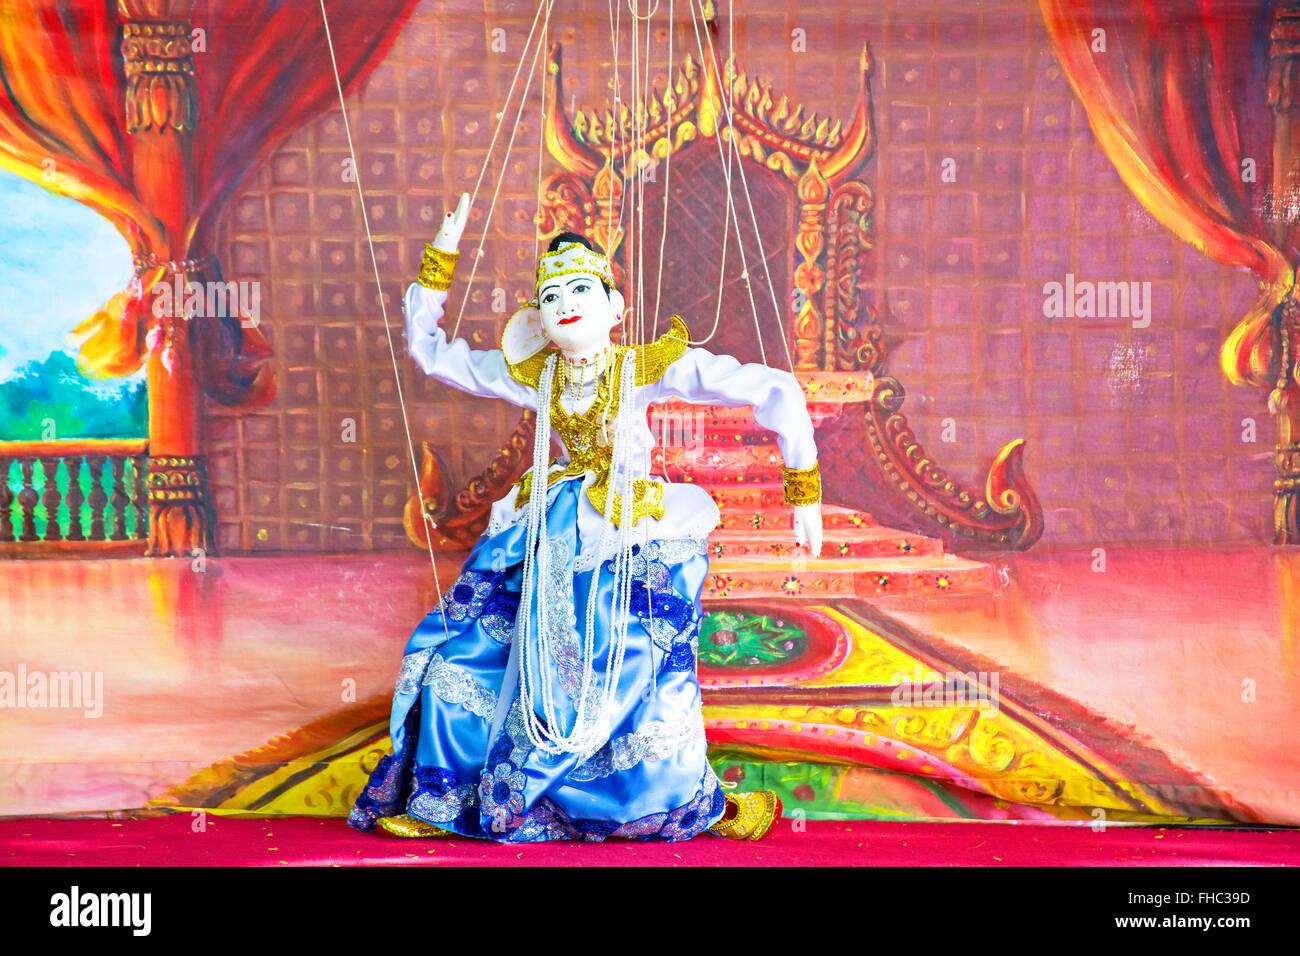 BAGO, MYANMAR - November 17, 2015: Yoke thé is the Burmese name for marionette puppetry.Burmese marionettes - Stock Image